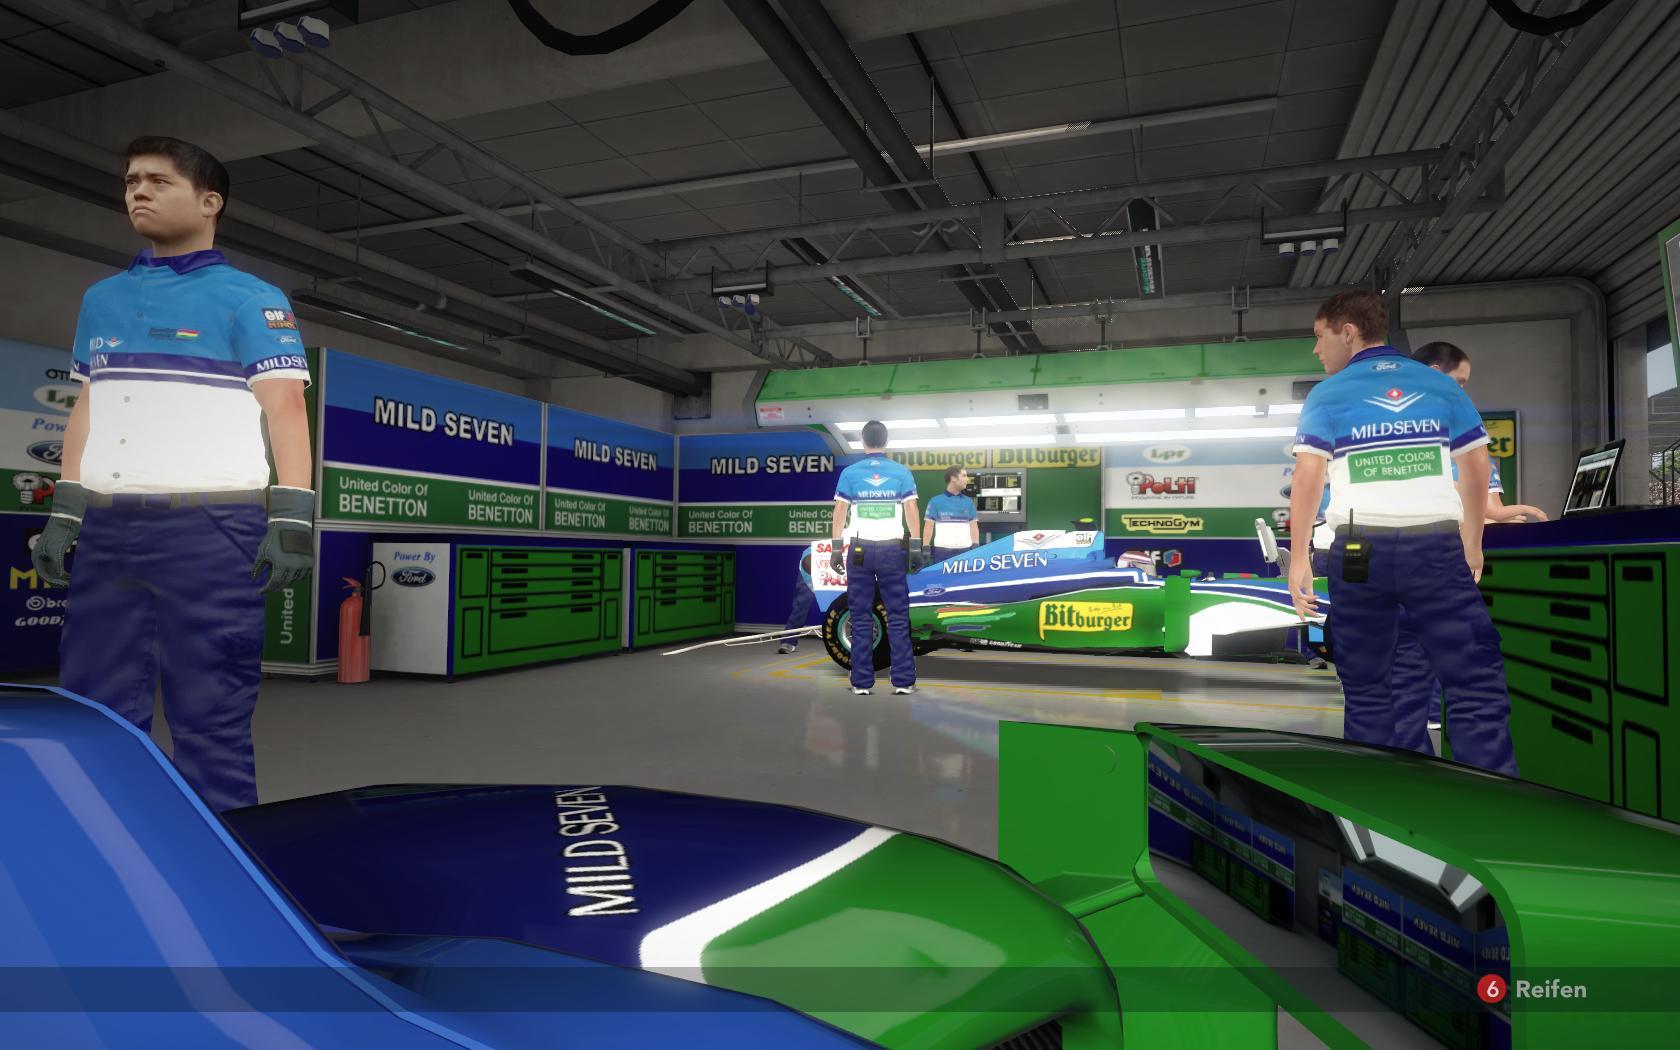 1994-Benetton-garage.jpg